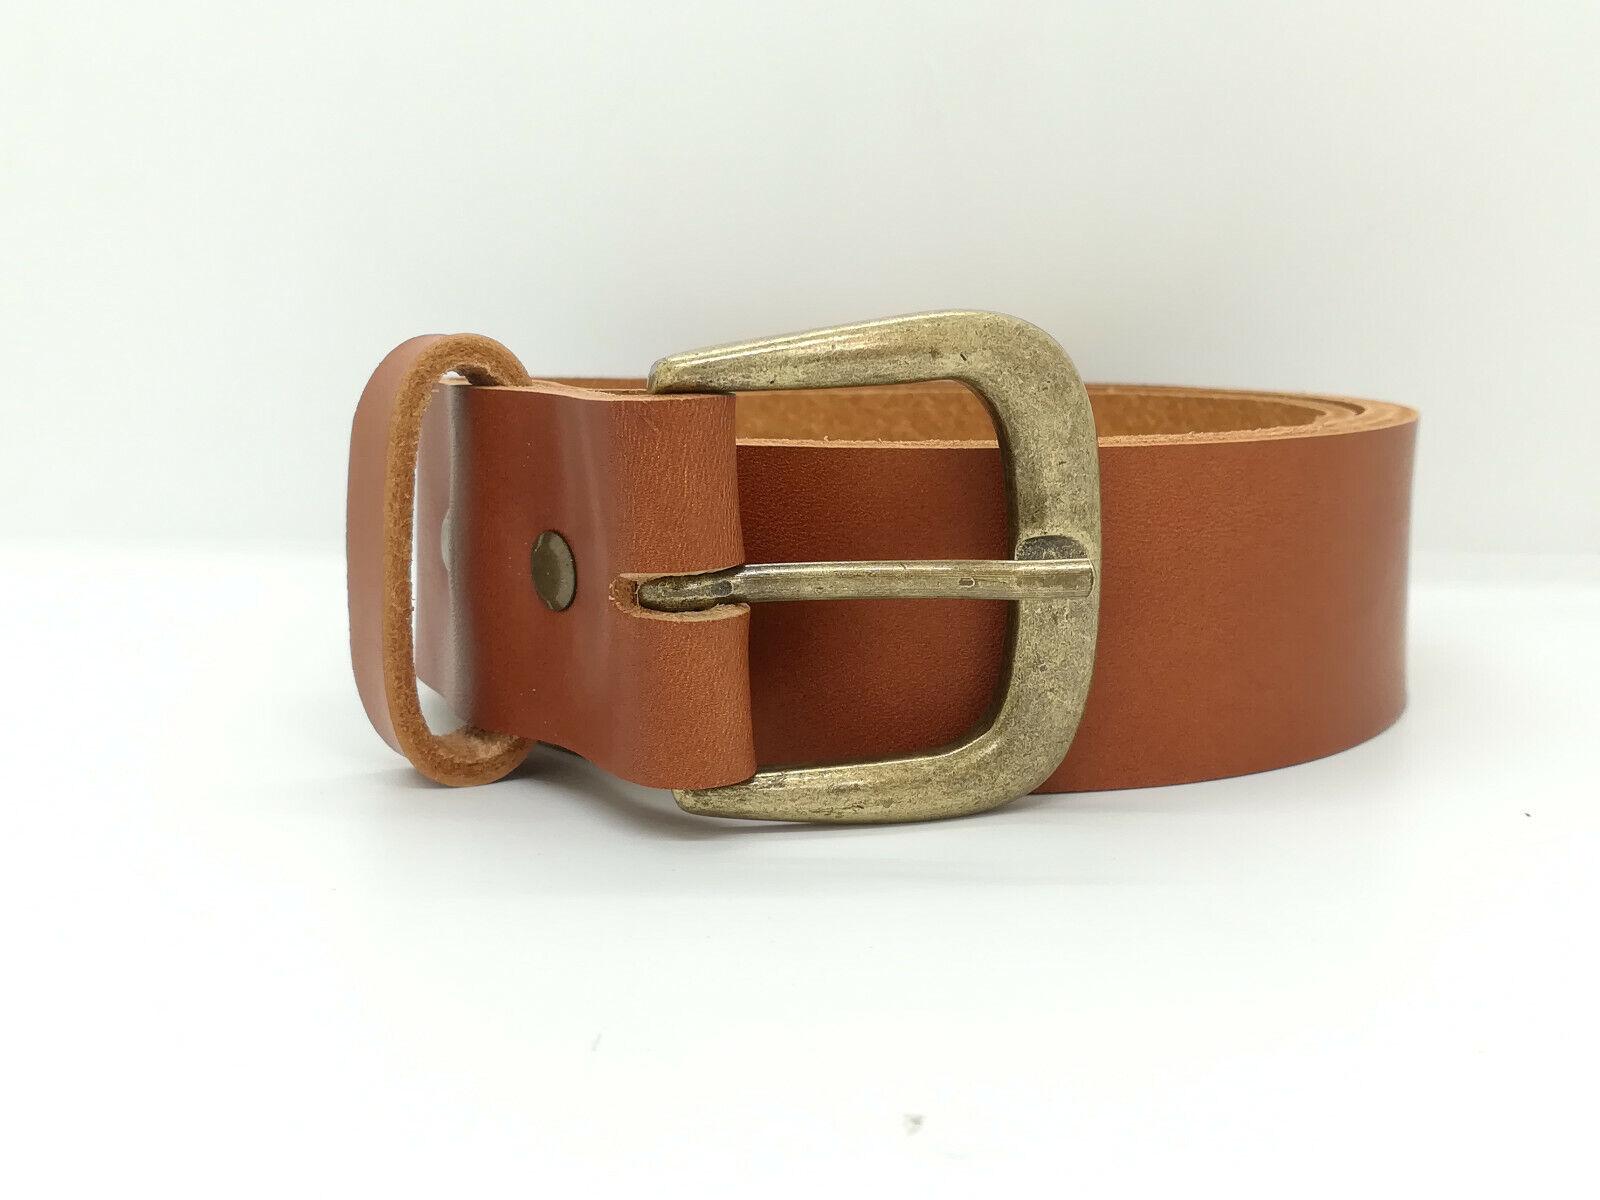 Ledergürtel Handmade Made in Germany genäht oder geschraubt Unikate